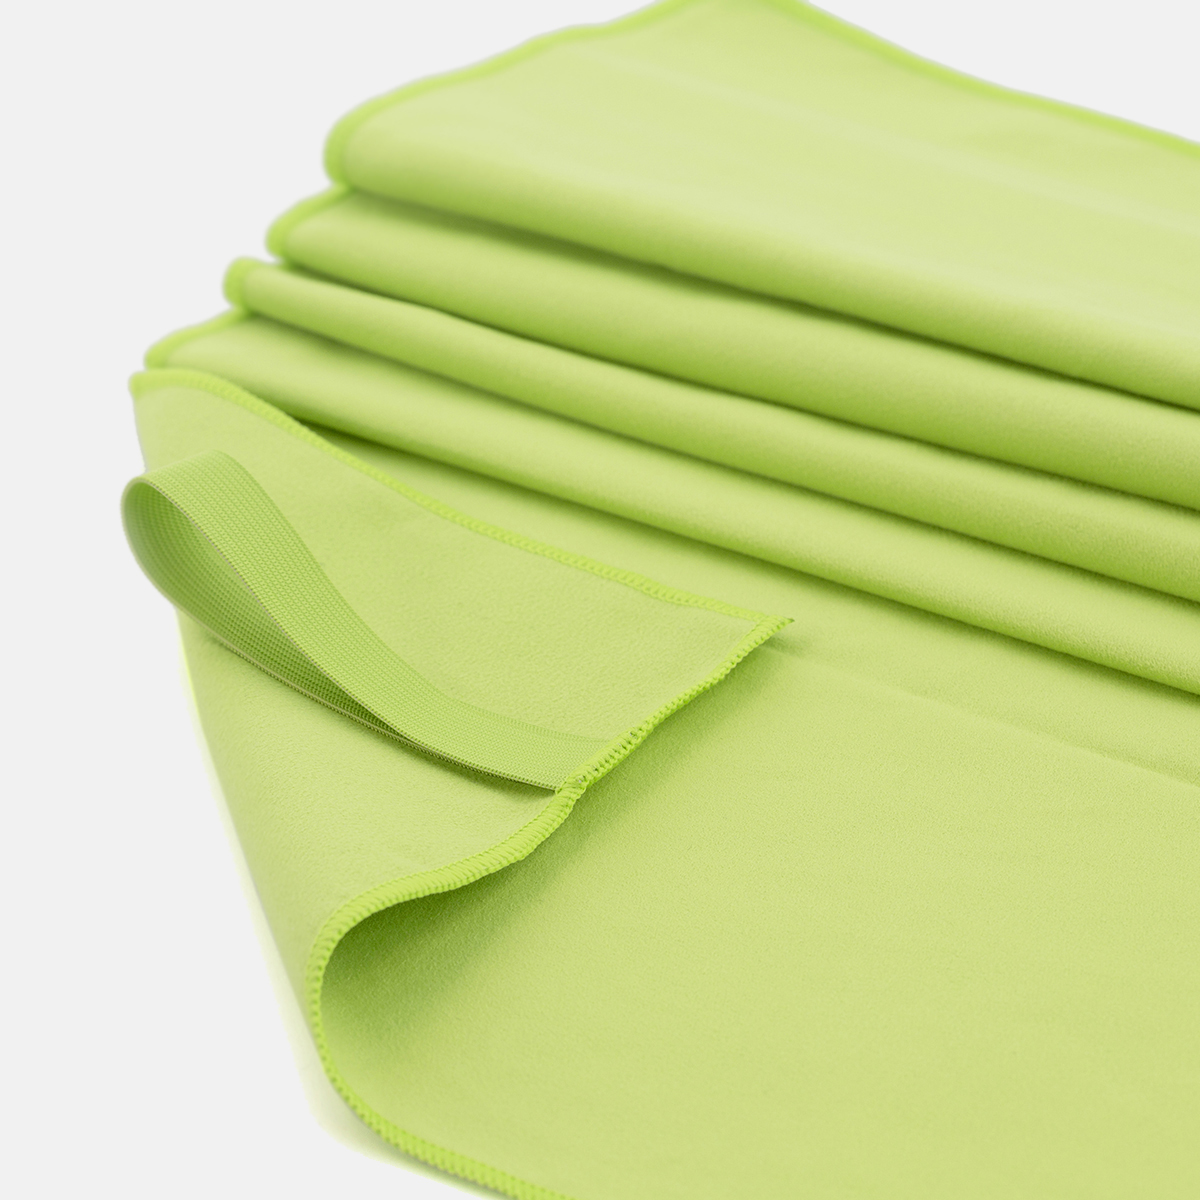 UNISEX'S BREMA-L MICROFIBER TOWEL GREEN